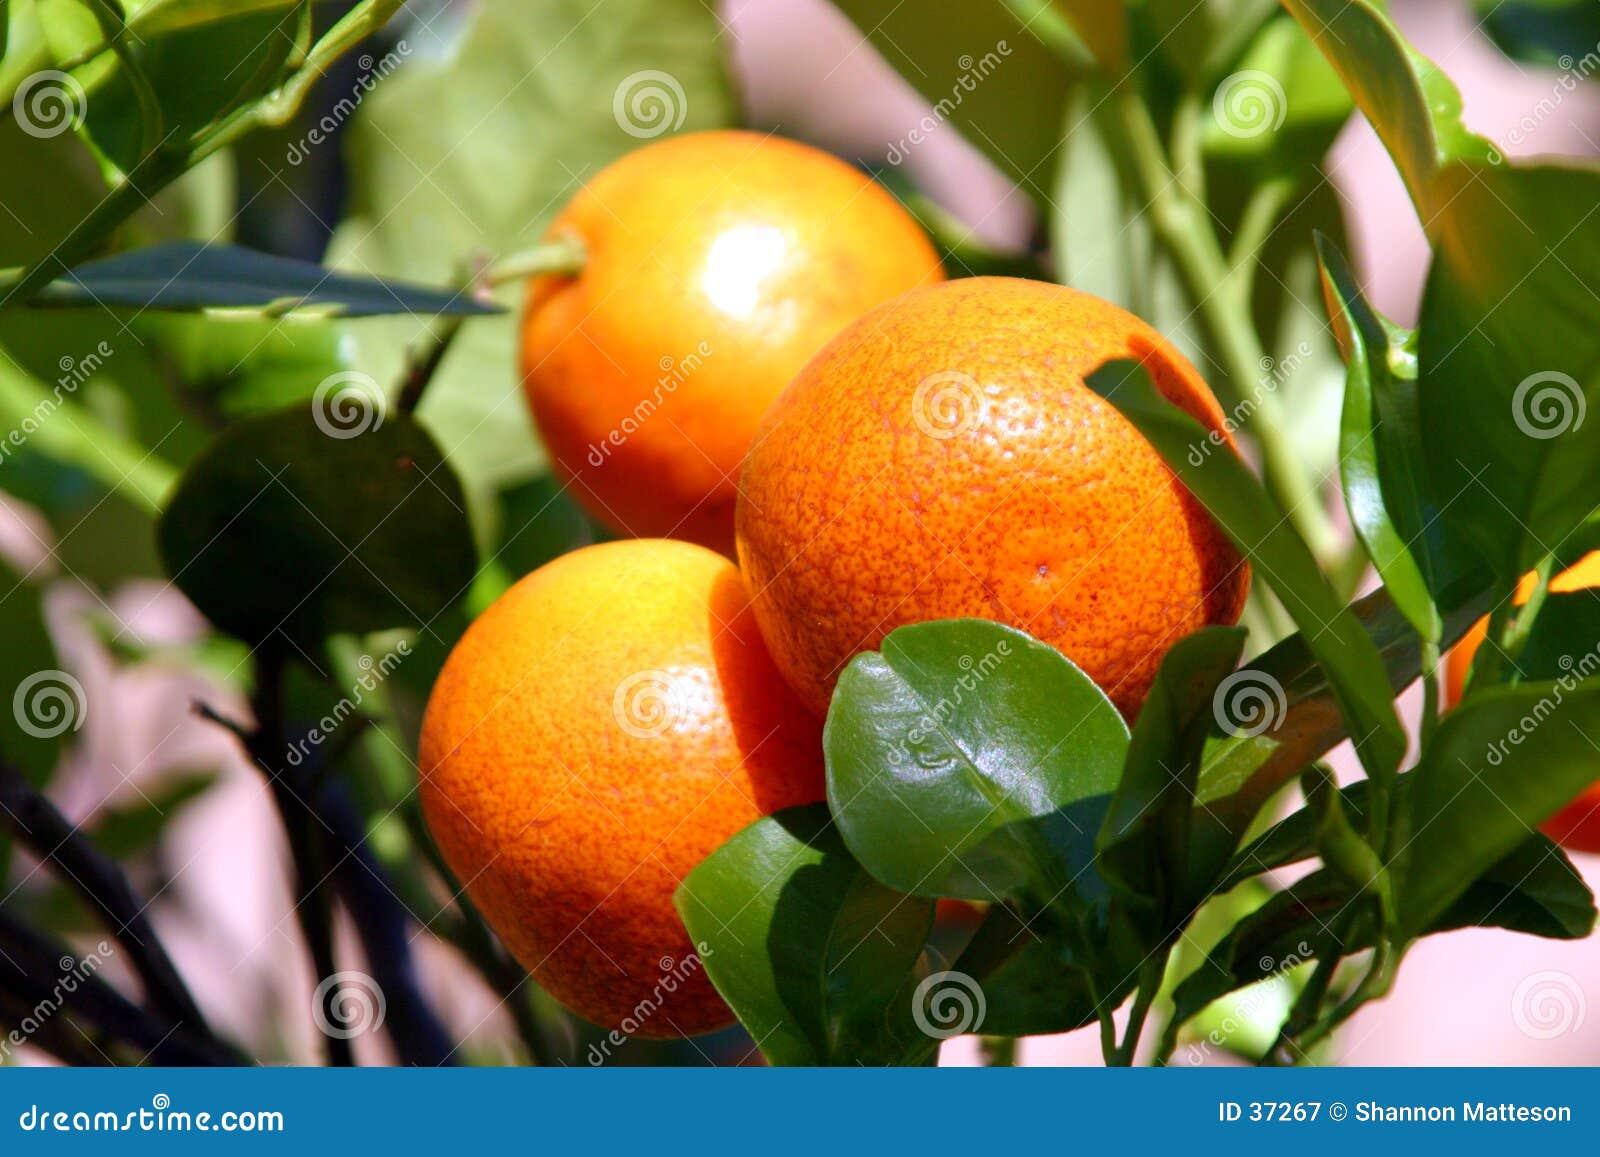 Verse Citrusvrucht